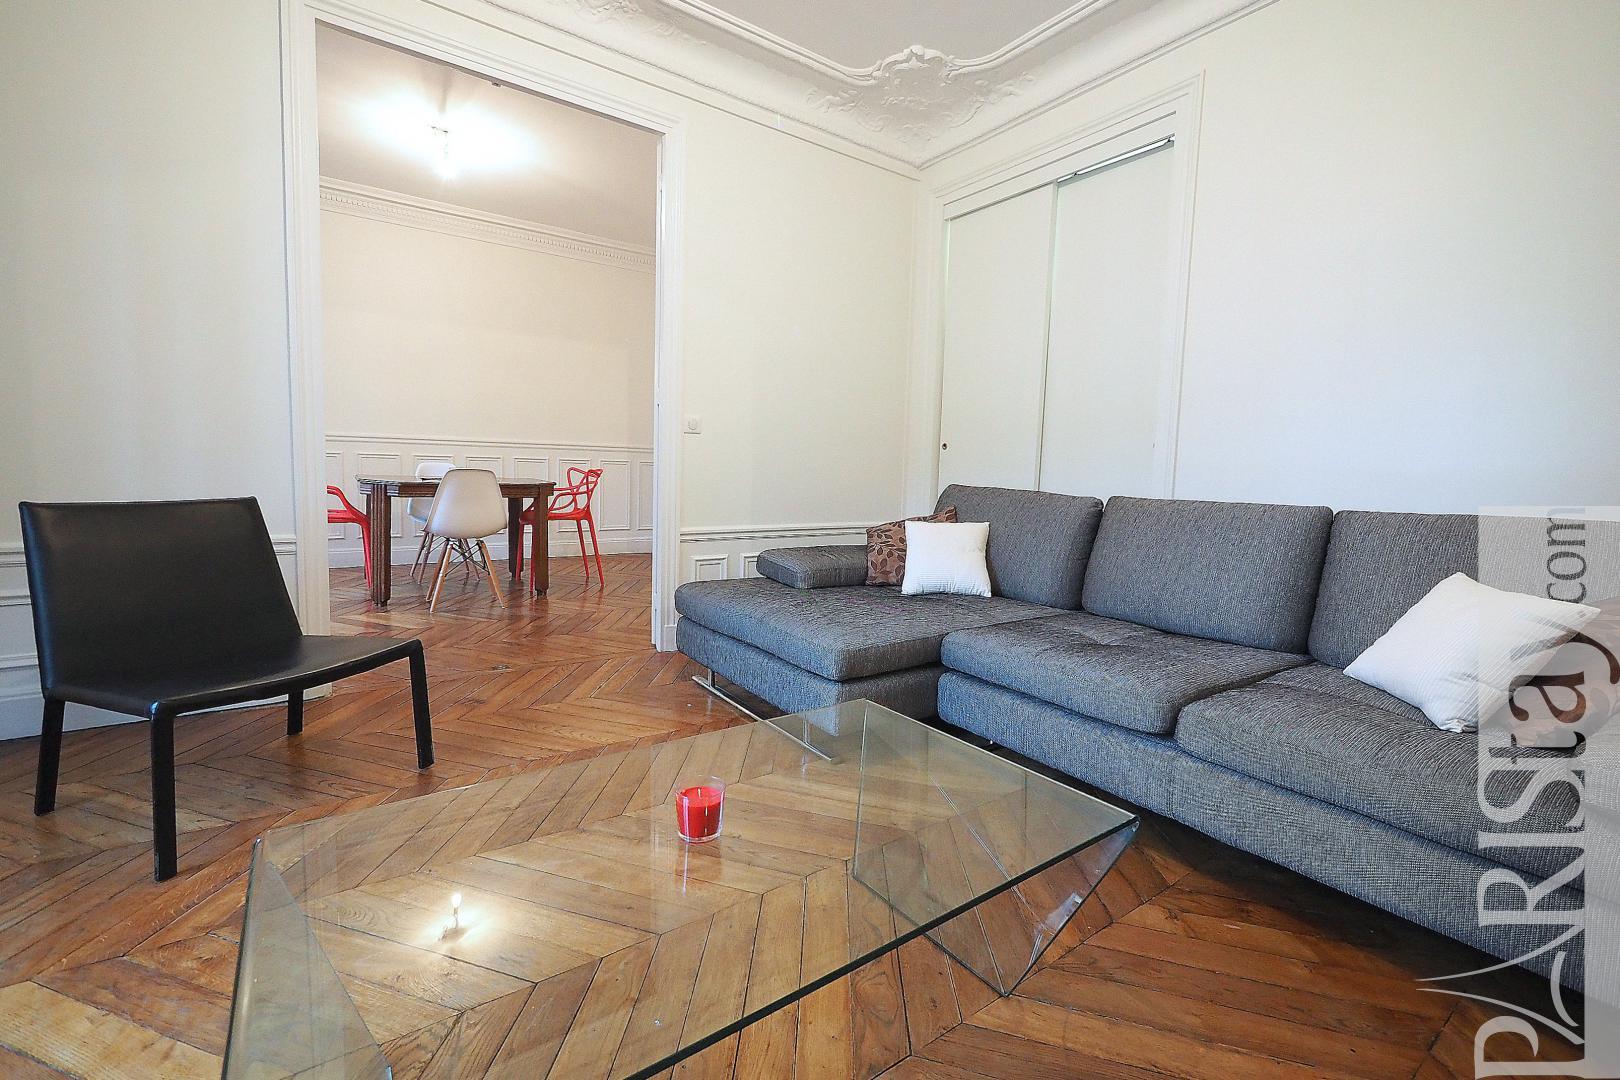 Location appartement meuble paris passy trocadero for Location paris meuble